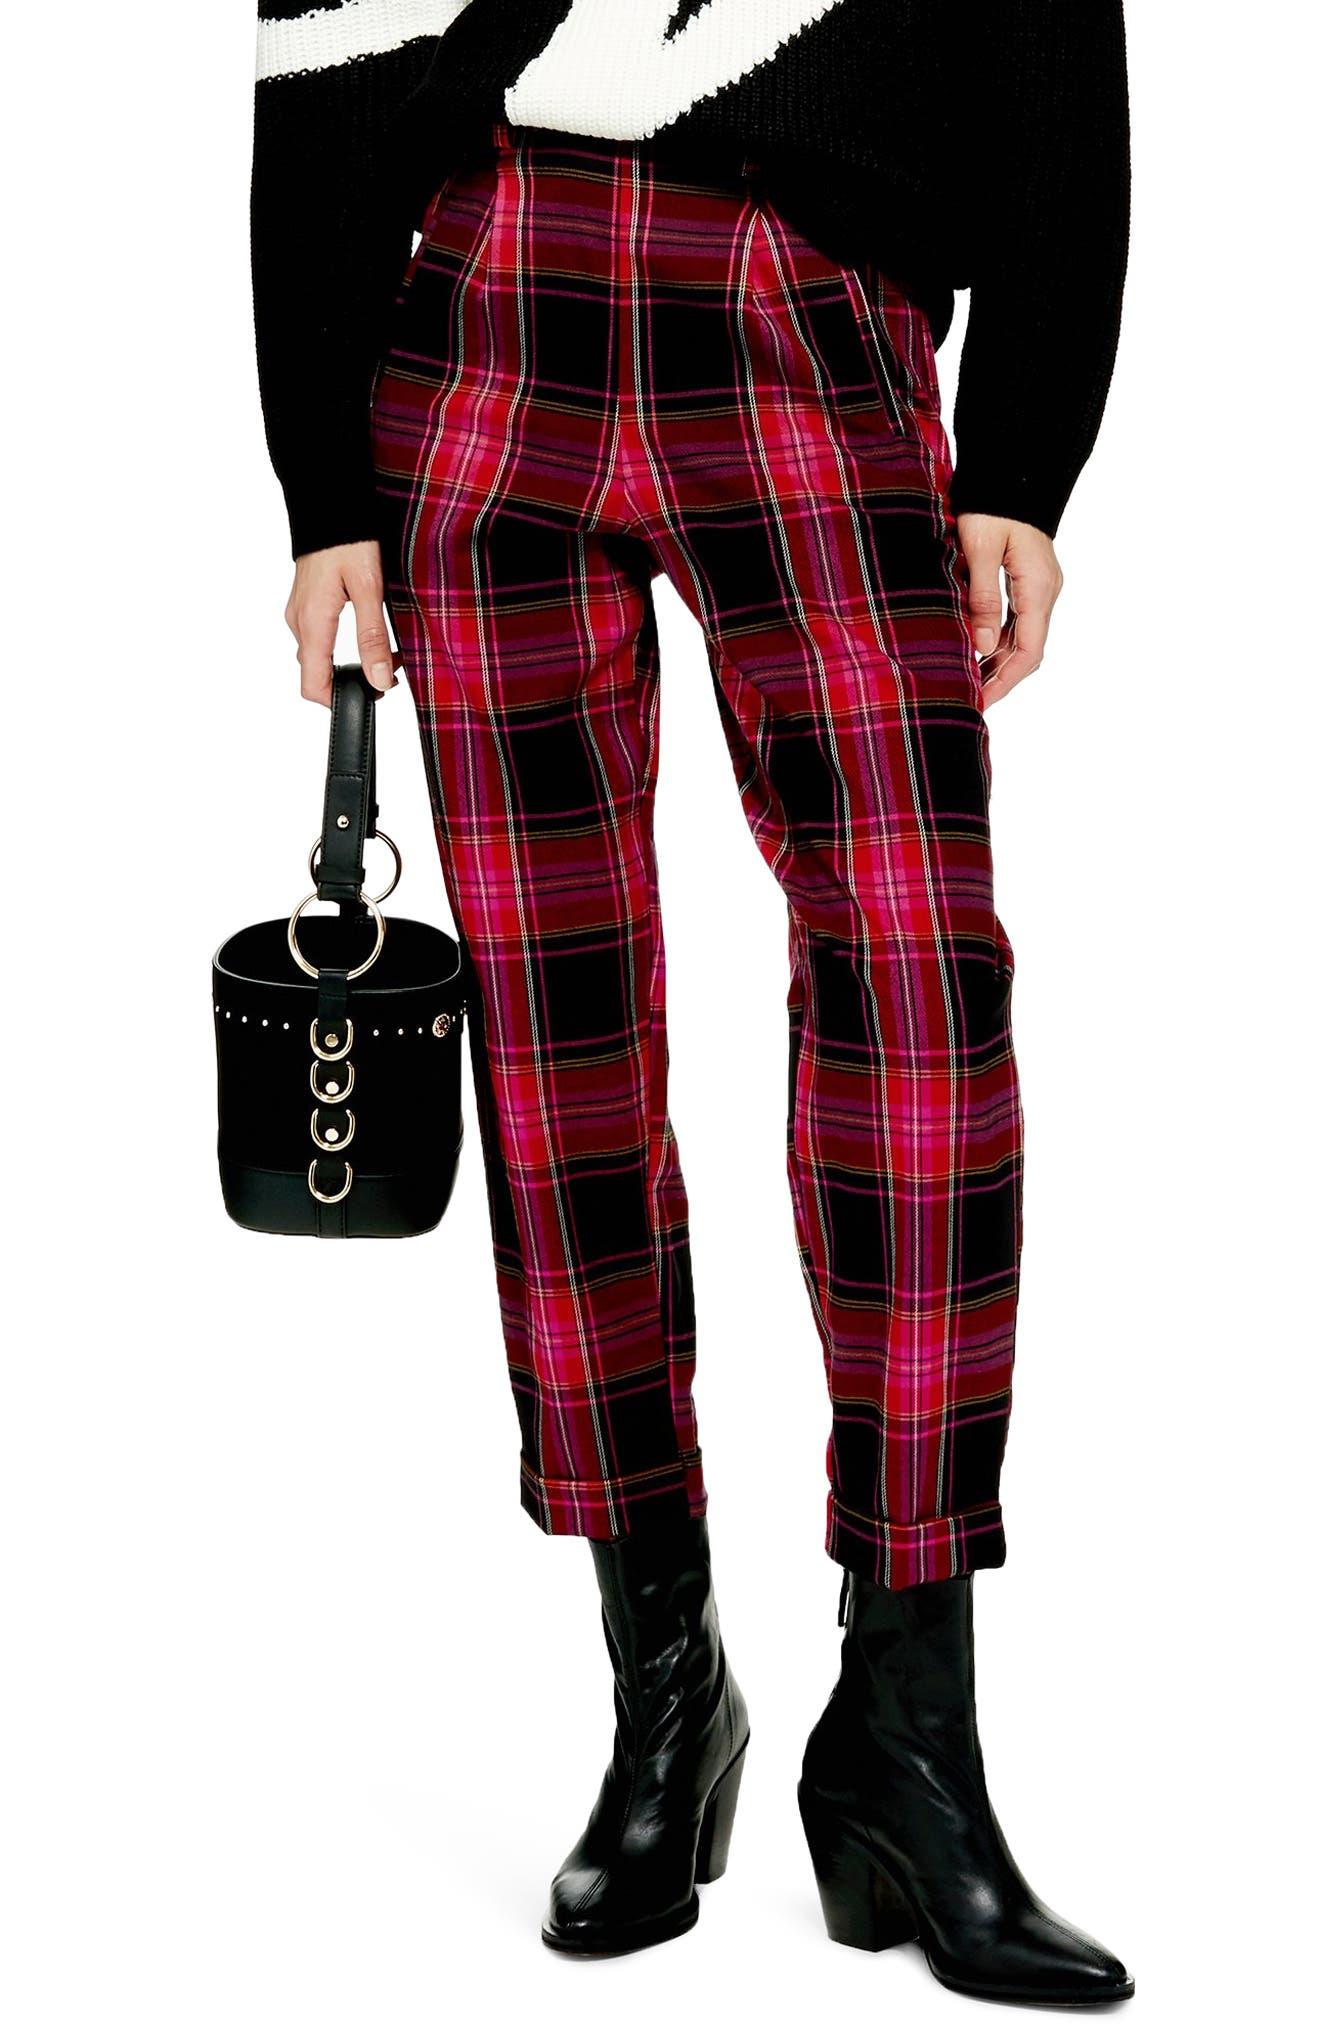 Martha Check Peg Leg Trousers,                             Main thumbnail 1, color,                             PINK MULTI